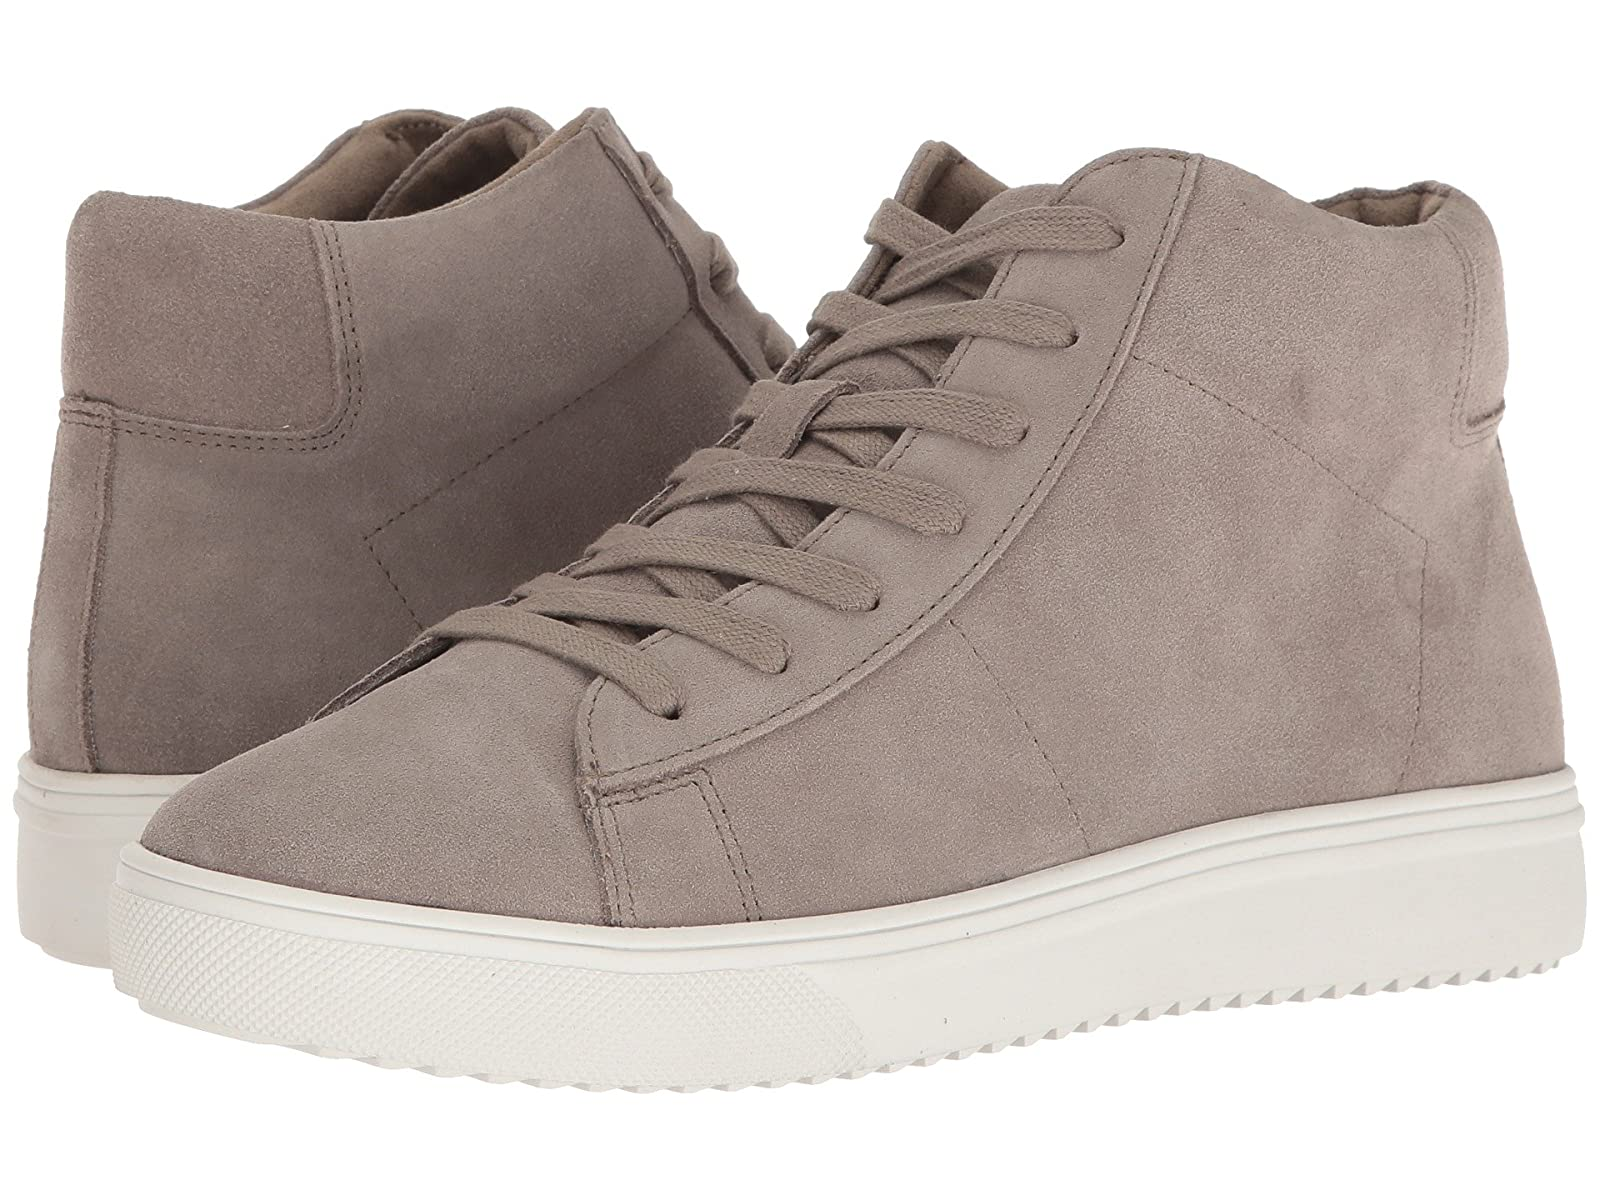 Blondo Jax WaterproofCheap and distinctive eye-catching shoes